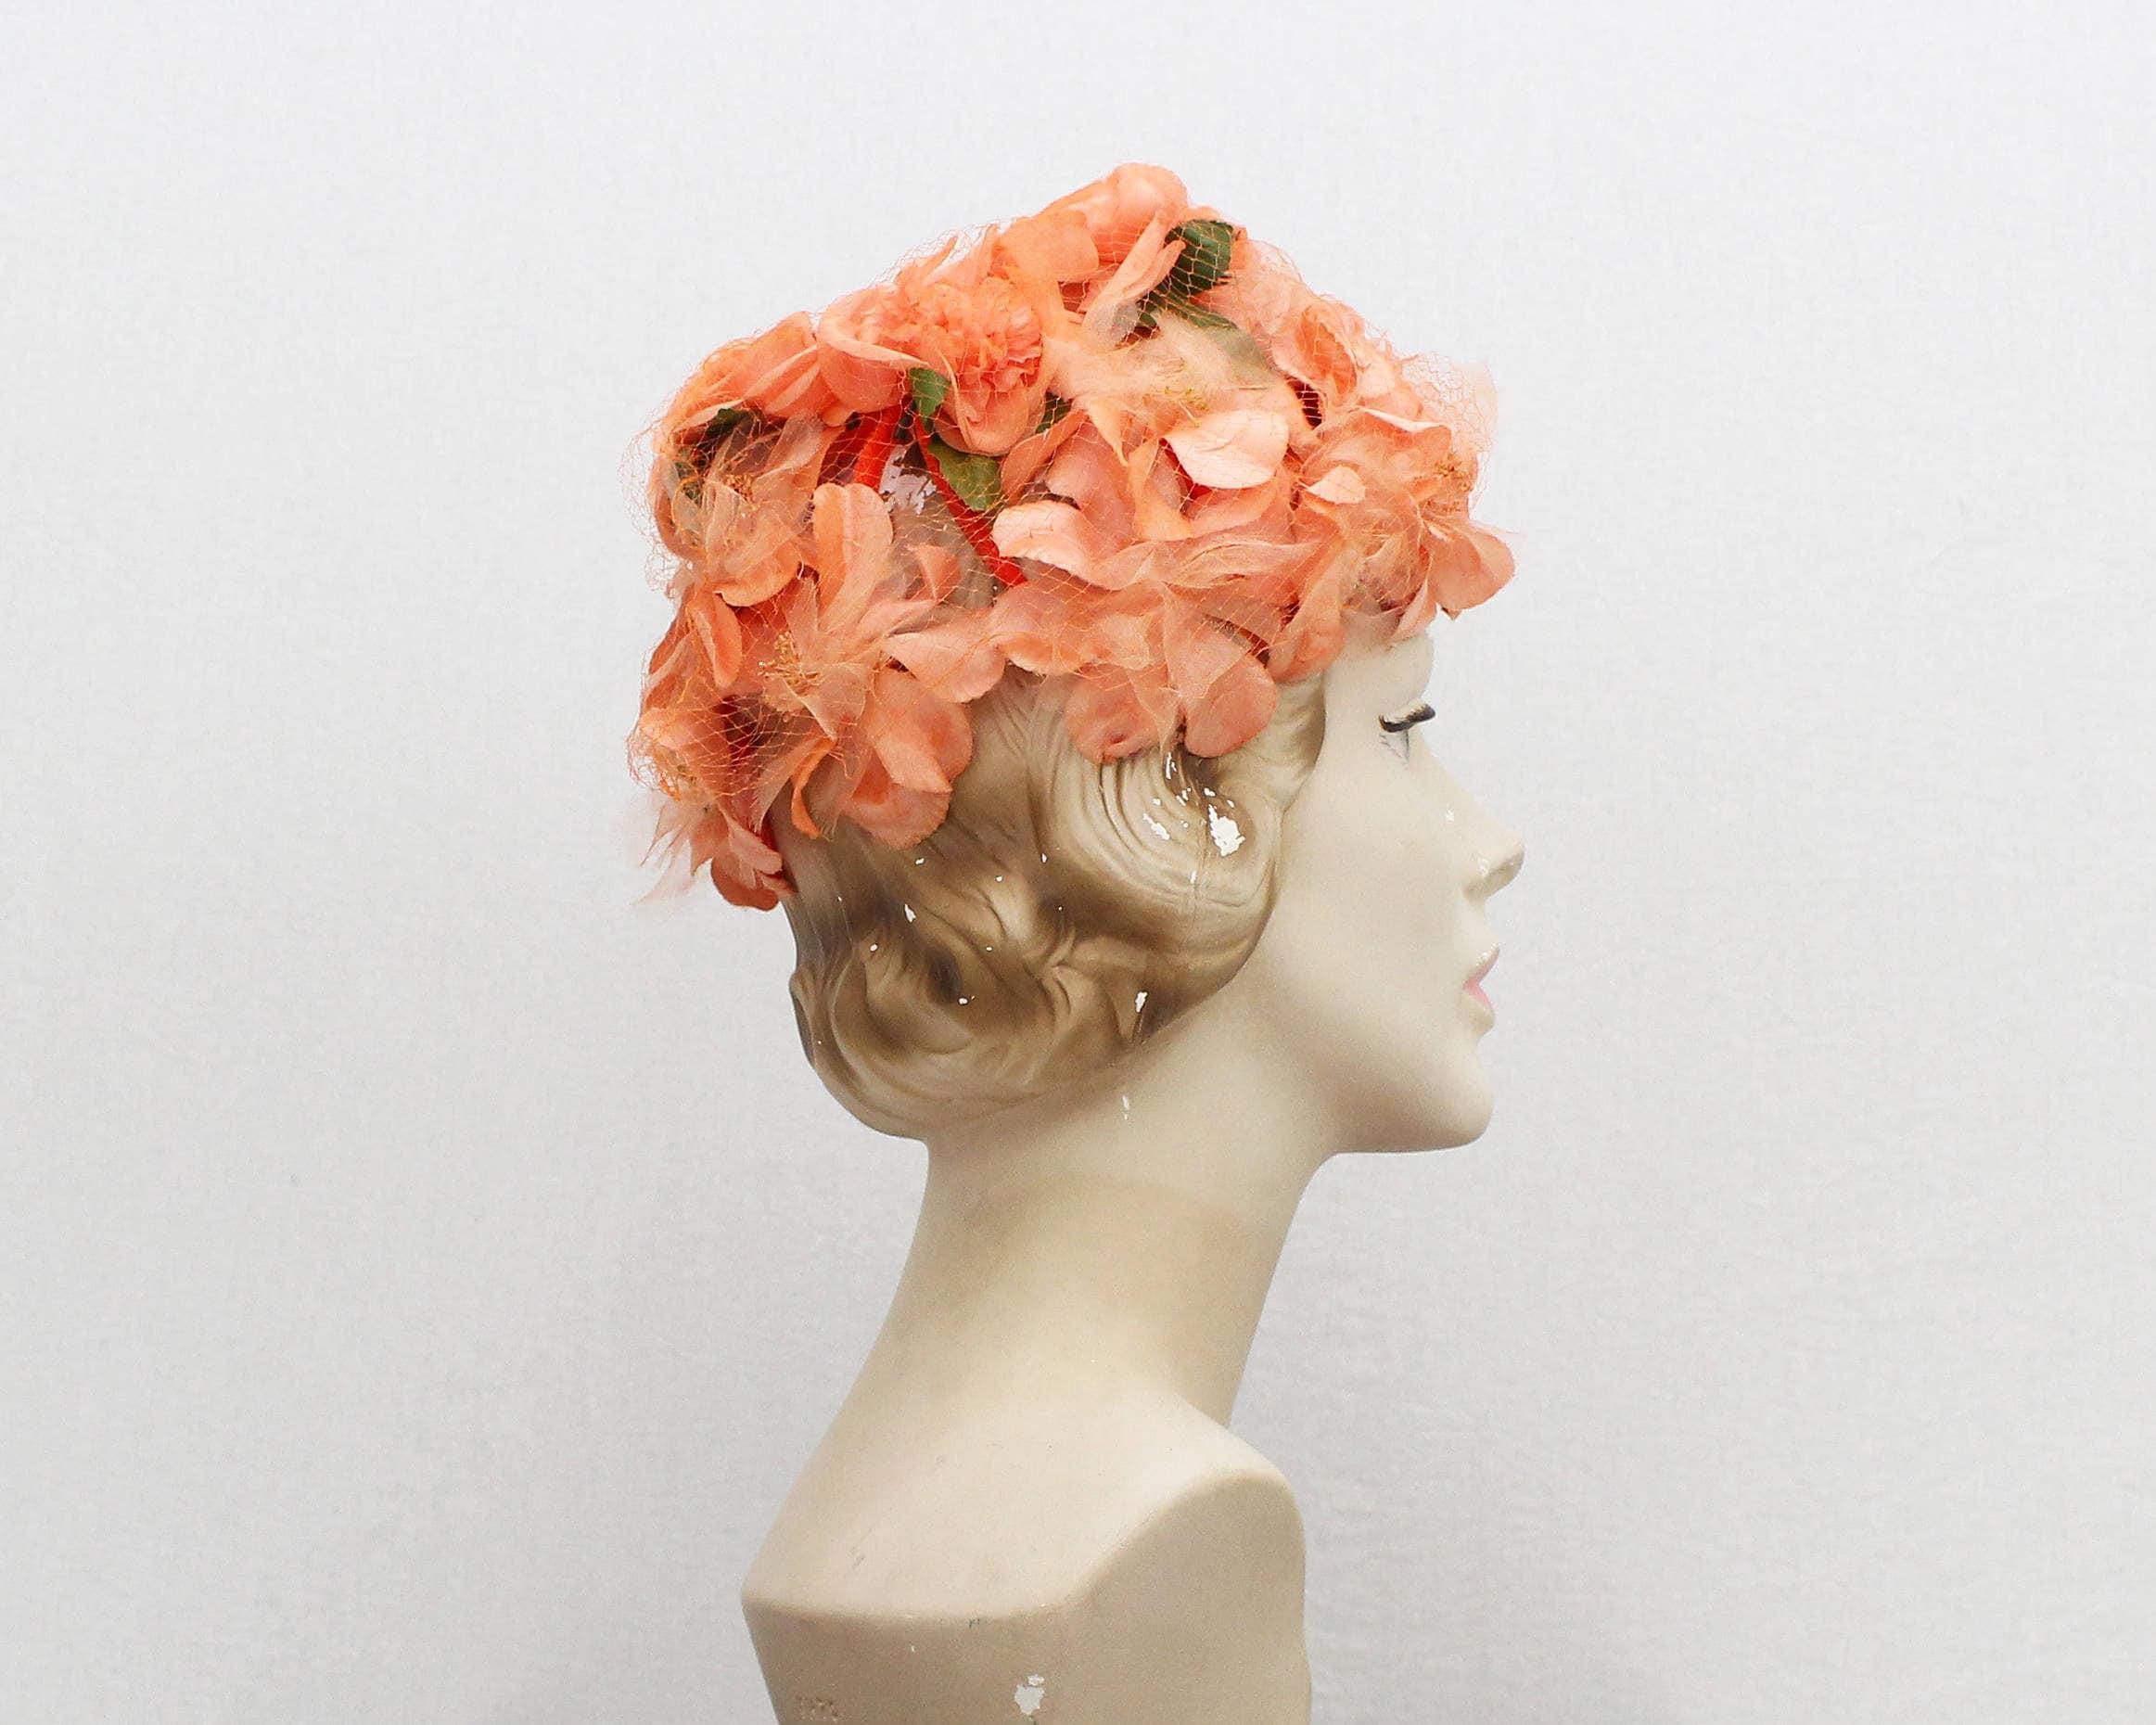 7afd99b17c8954 50s Coral Peach Floral Cage Hat - Vintage 1950s Women's Flower Hat